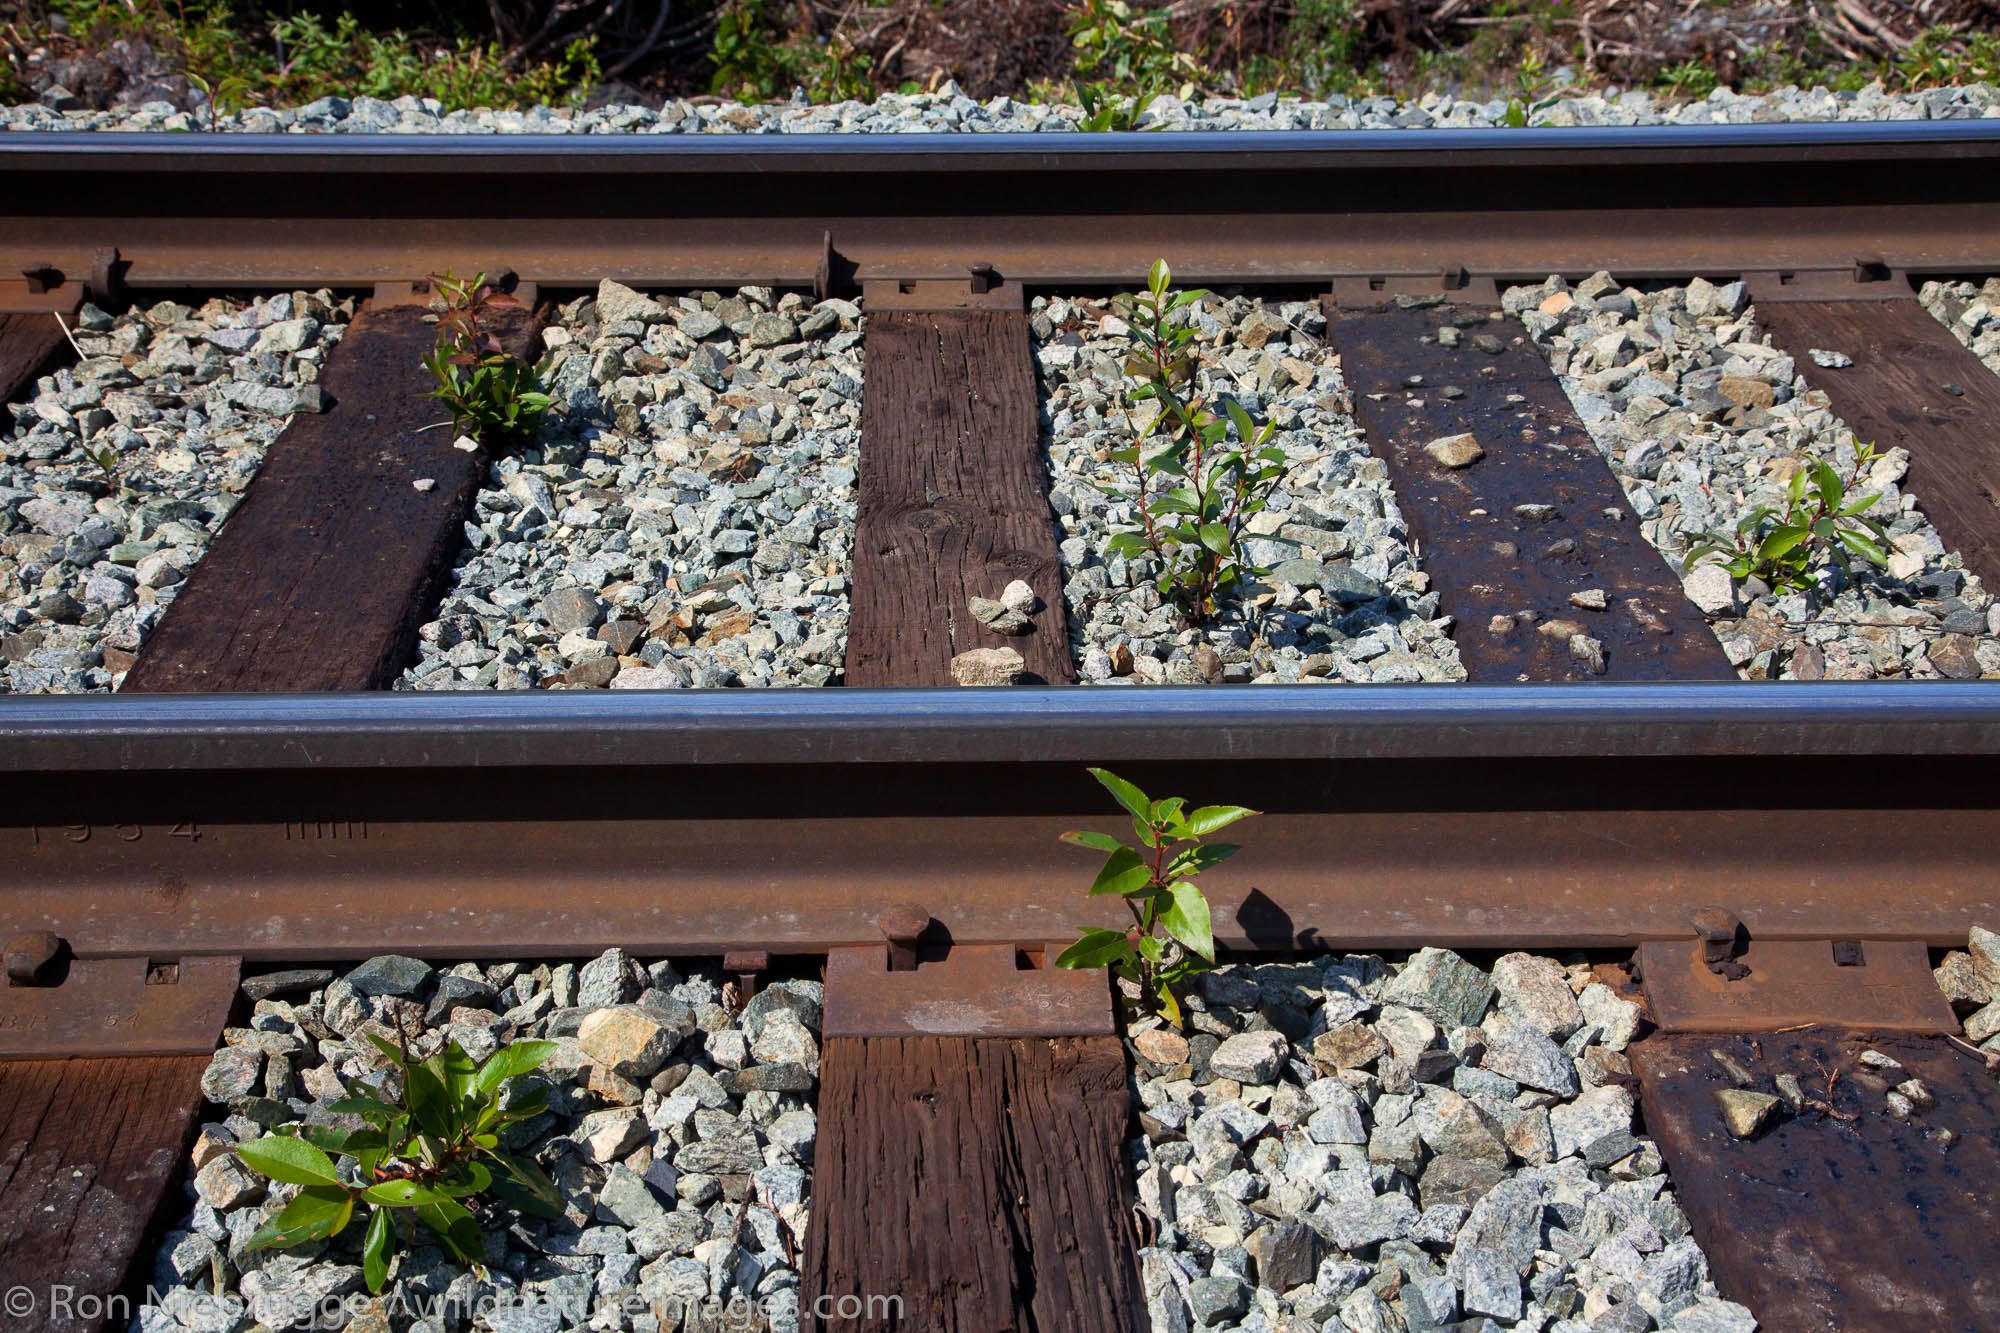 Plants growning in the tracks of the Alaska Railroad to Spencer Glacier, Chugach National Forest, Alaska.